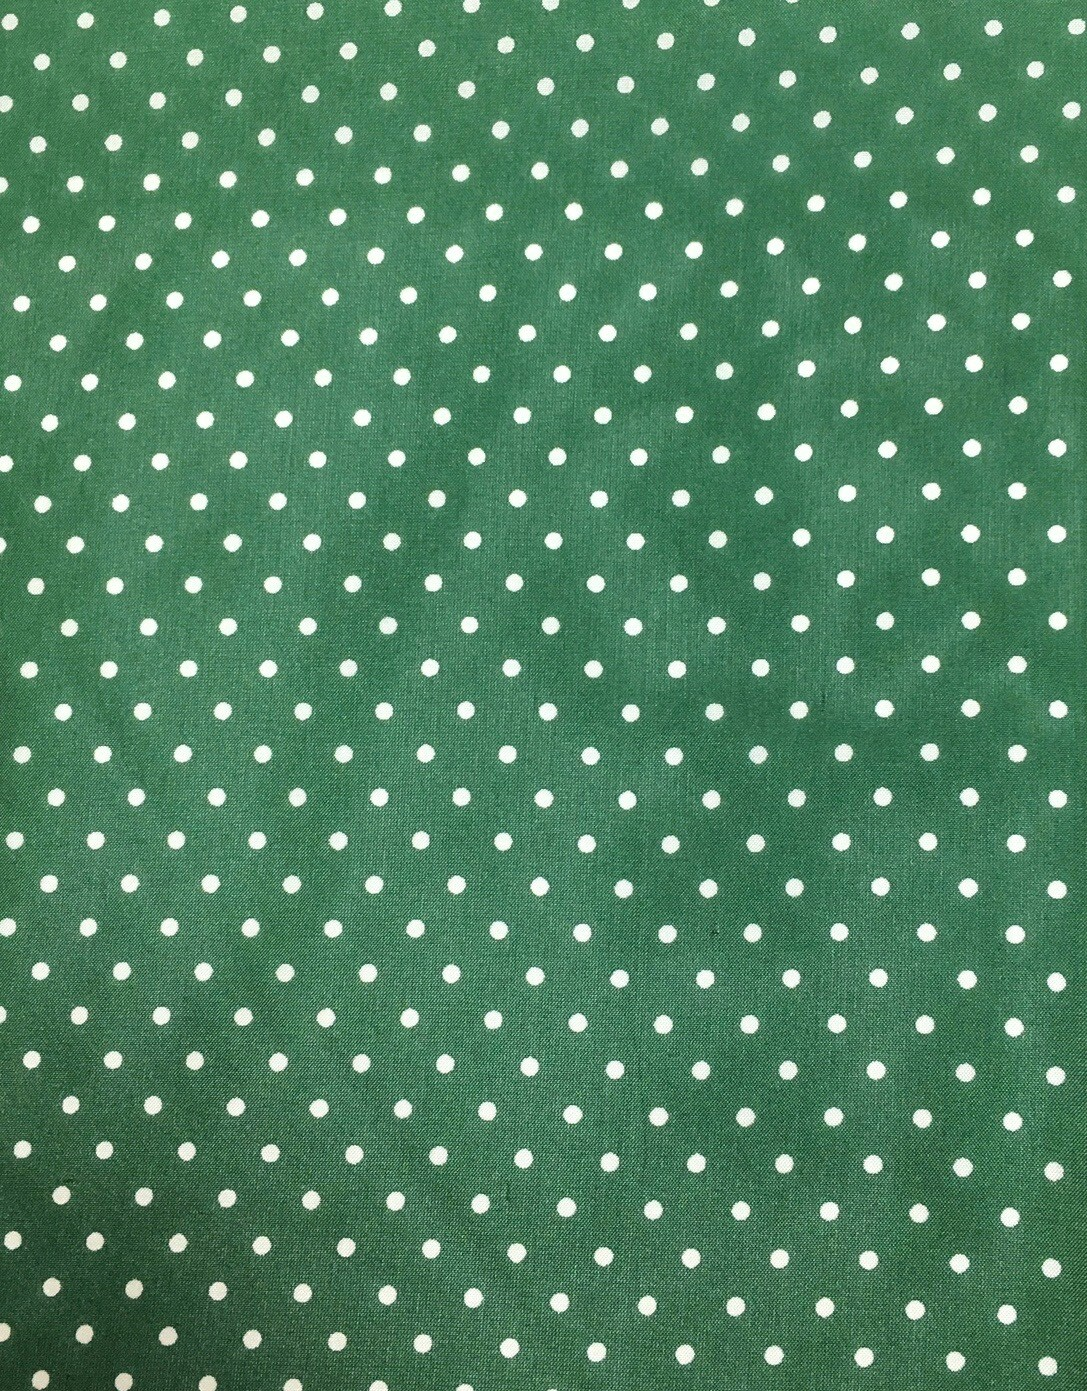 Forest Green Polka Dot Wild Rag